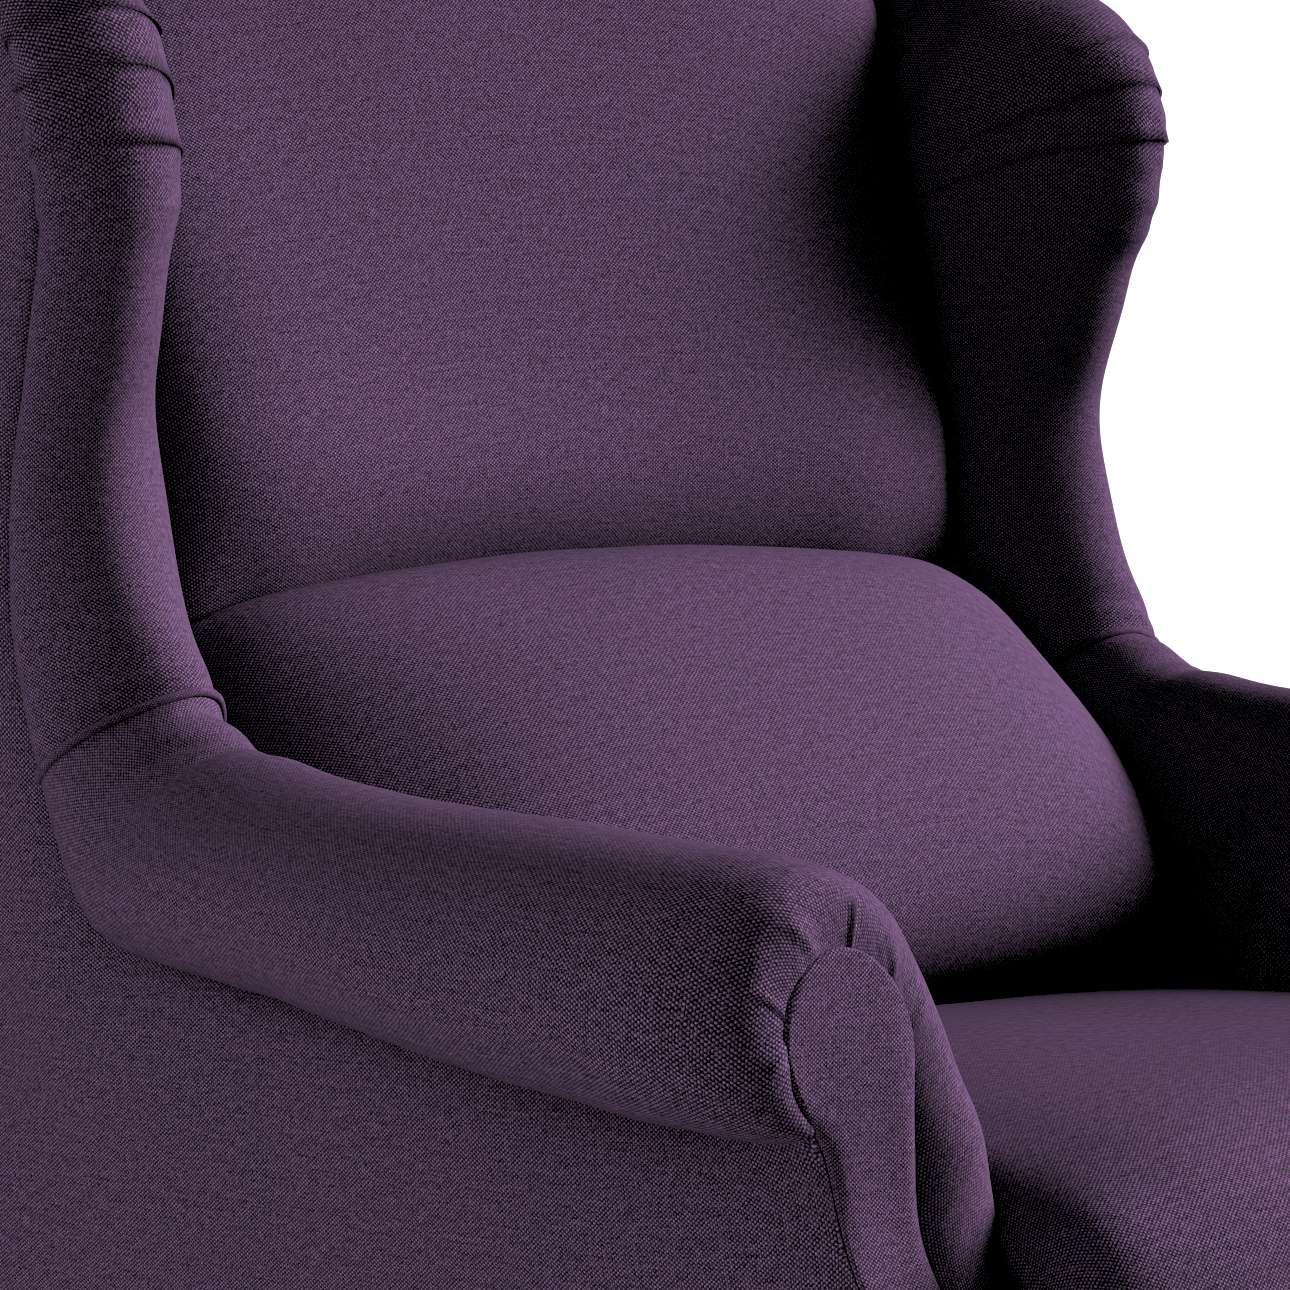 Fotel Unique w kolekcji Etna, tkanina: 161-27